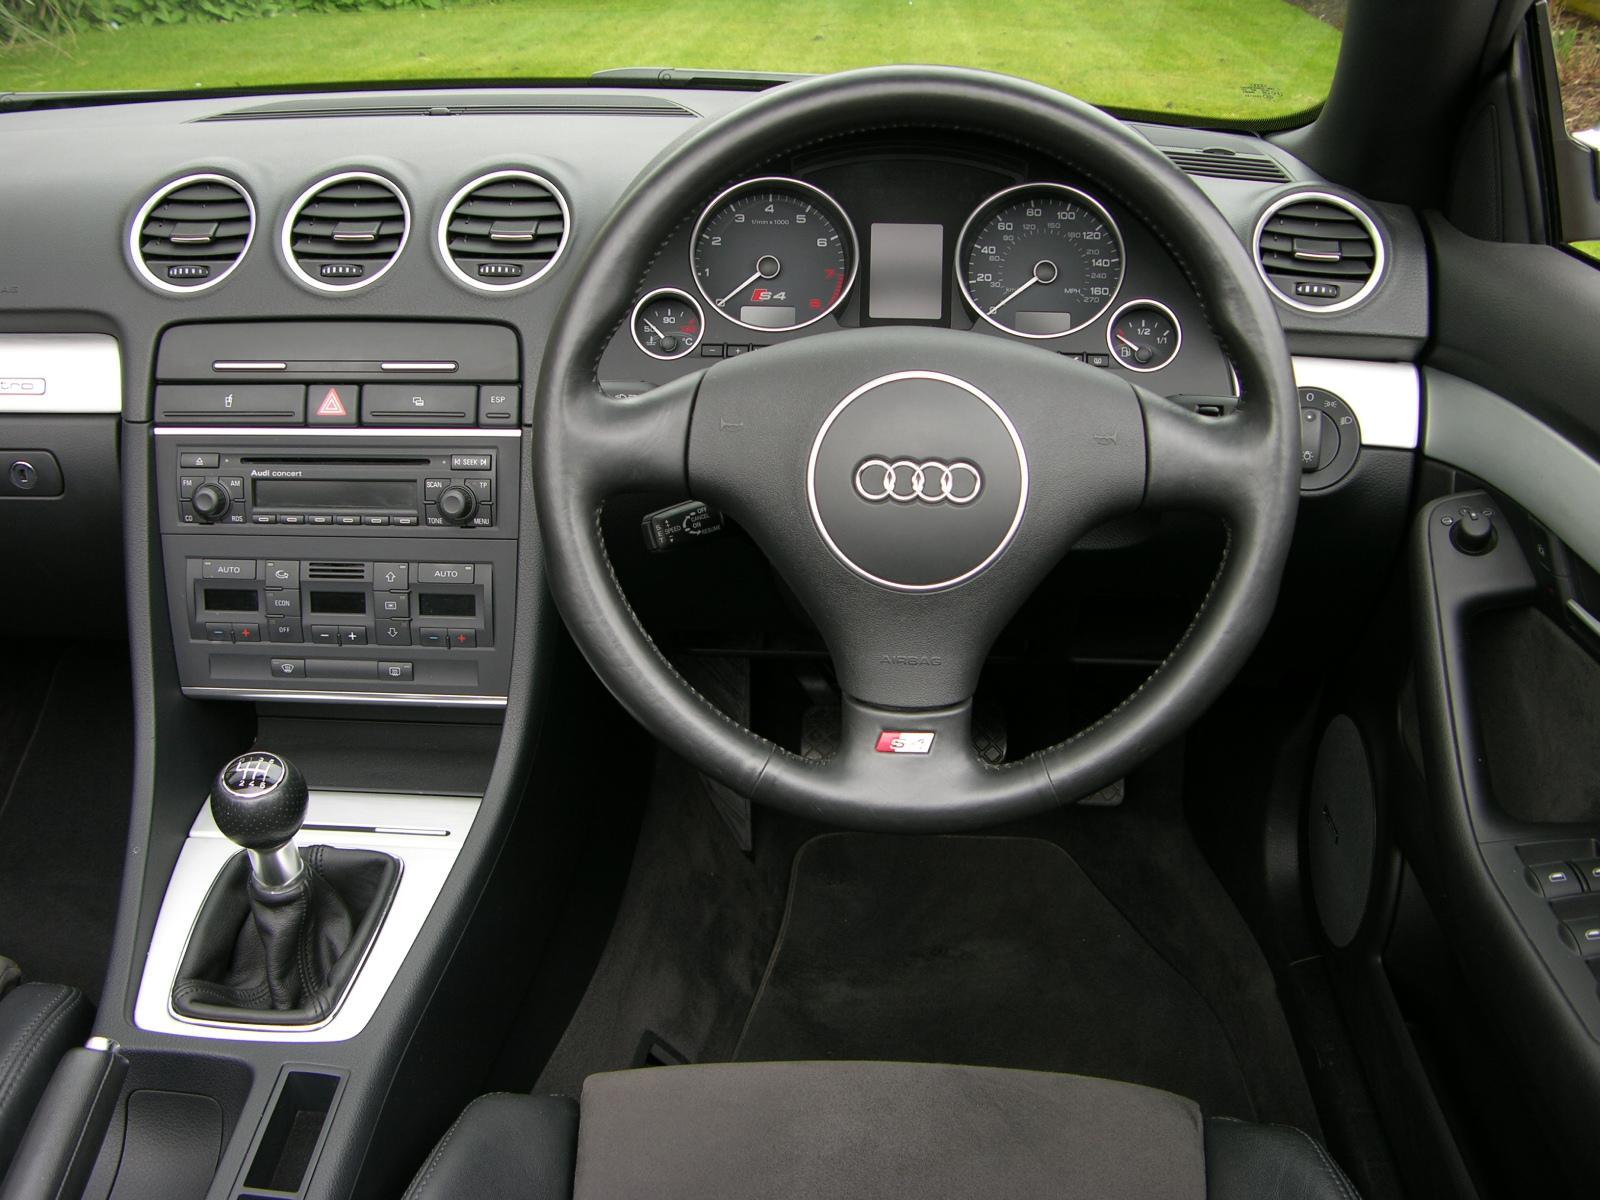 File Audi A4 B7 Cabriolet Dashboard Jpg Wikimedia Commons